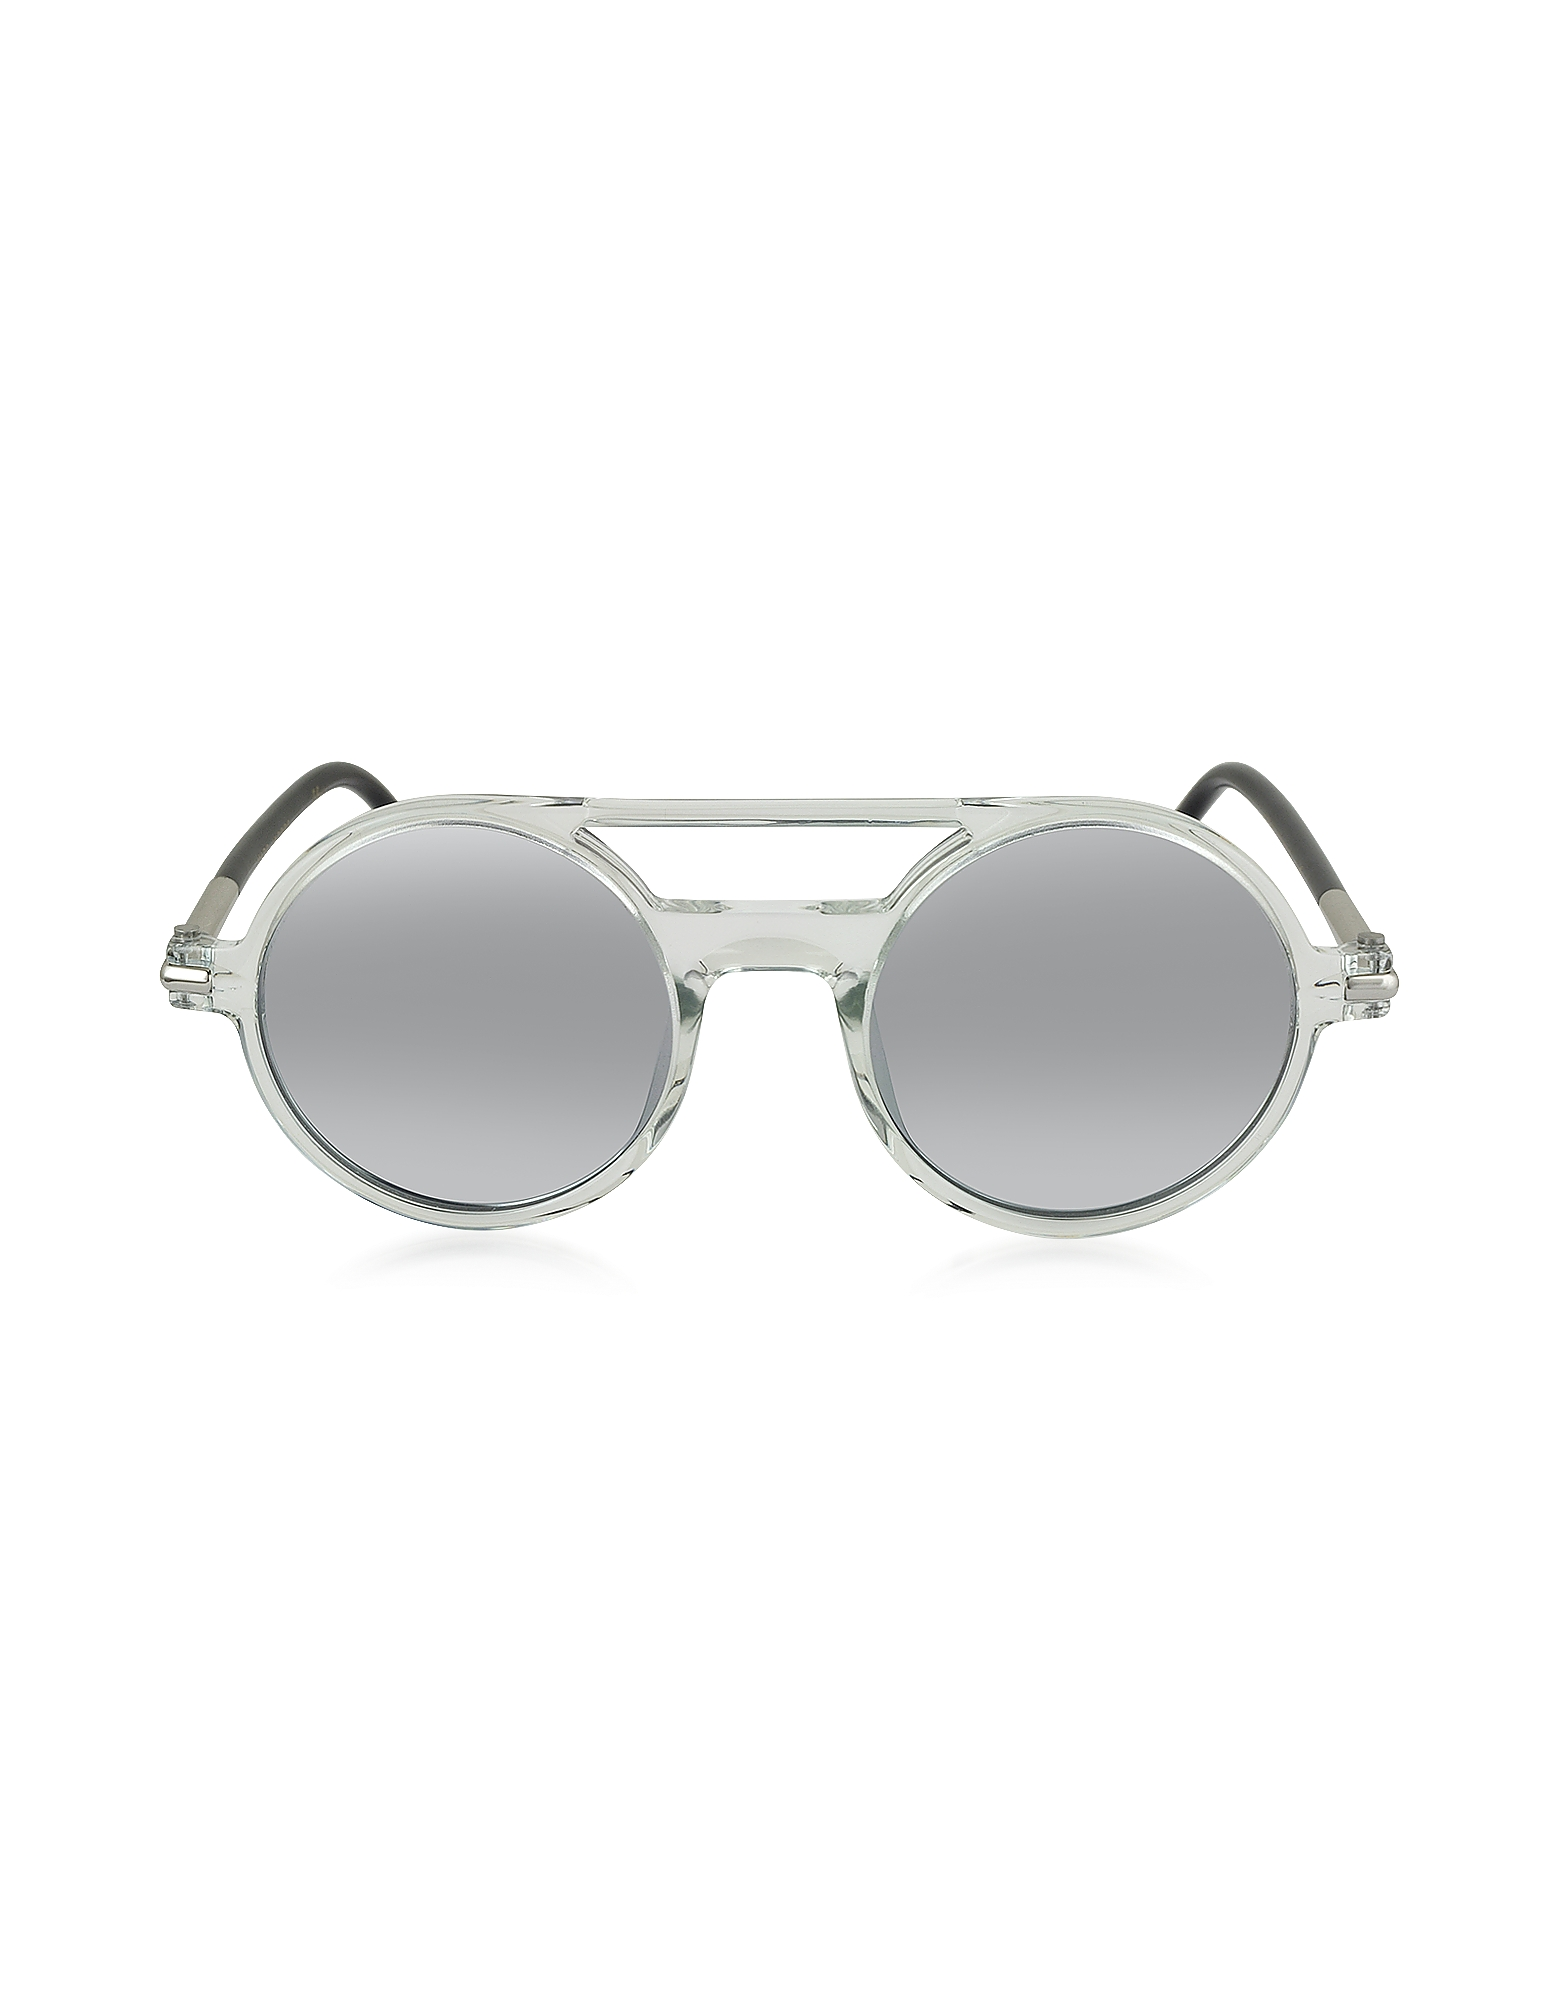 Marc Jacobs Sunglasses, MARC 45/S Acetate Round Aviator Women's Sunglasses